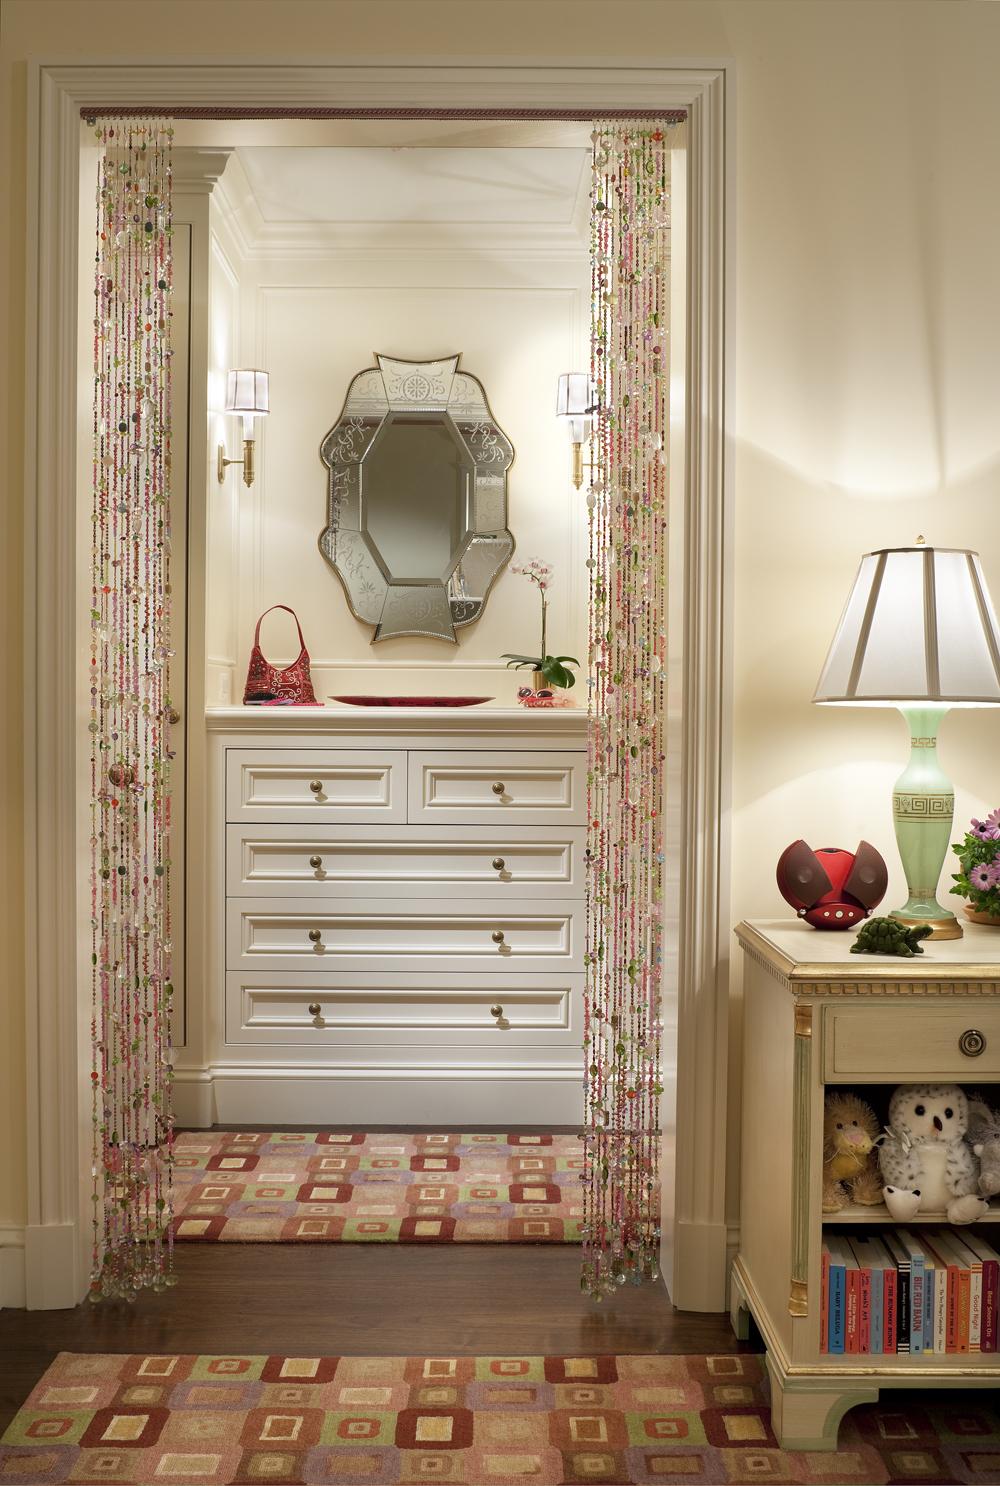 LSI-web-fifth-ave-interior-bedroom-entrance-3.jpg